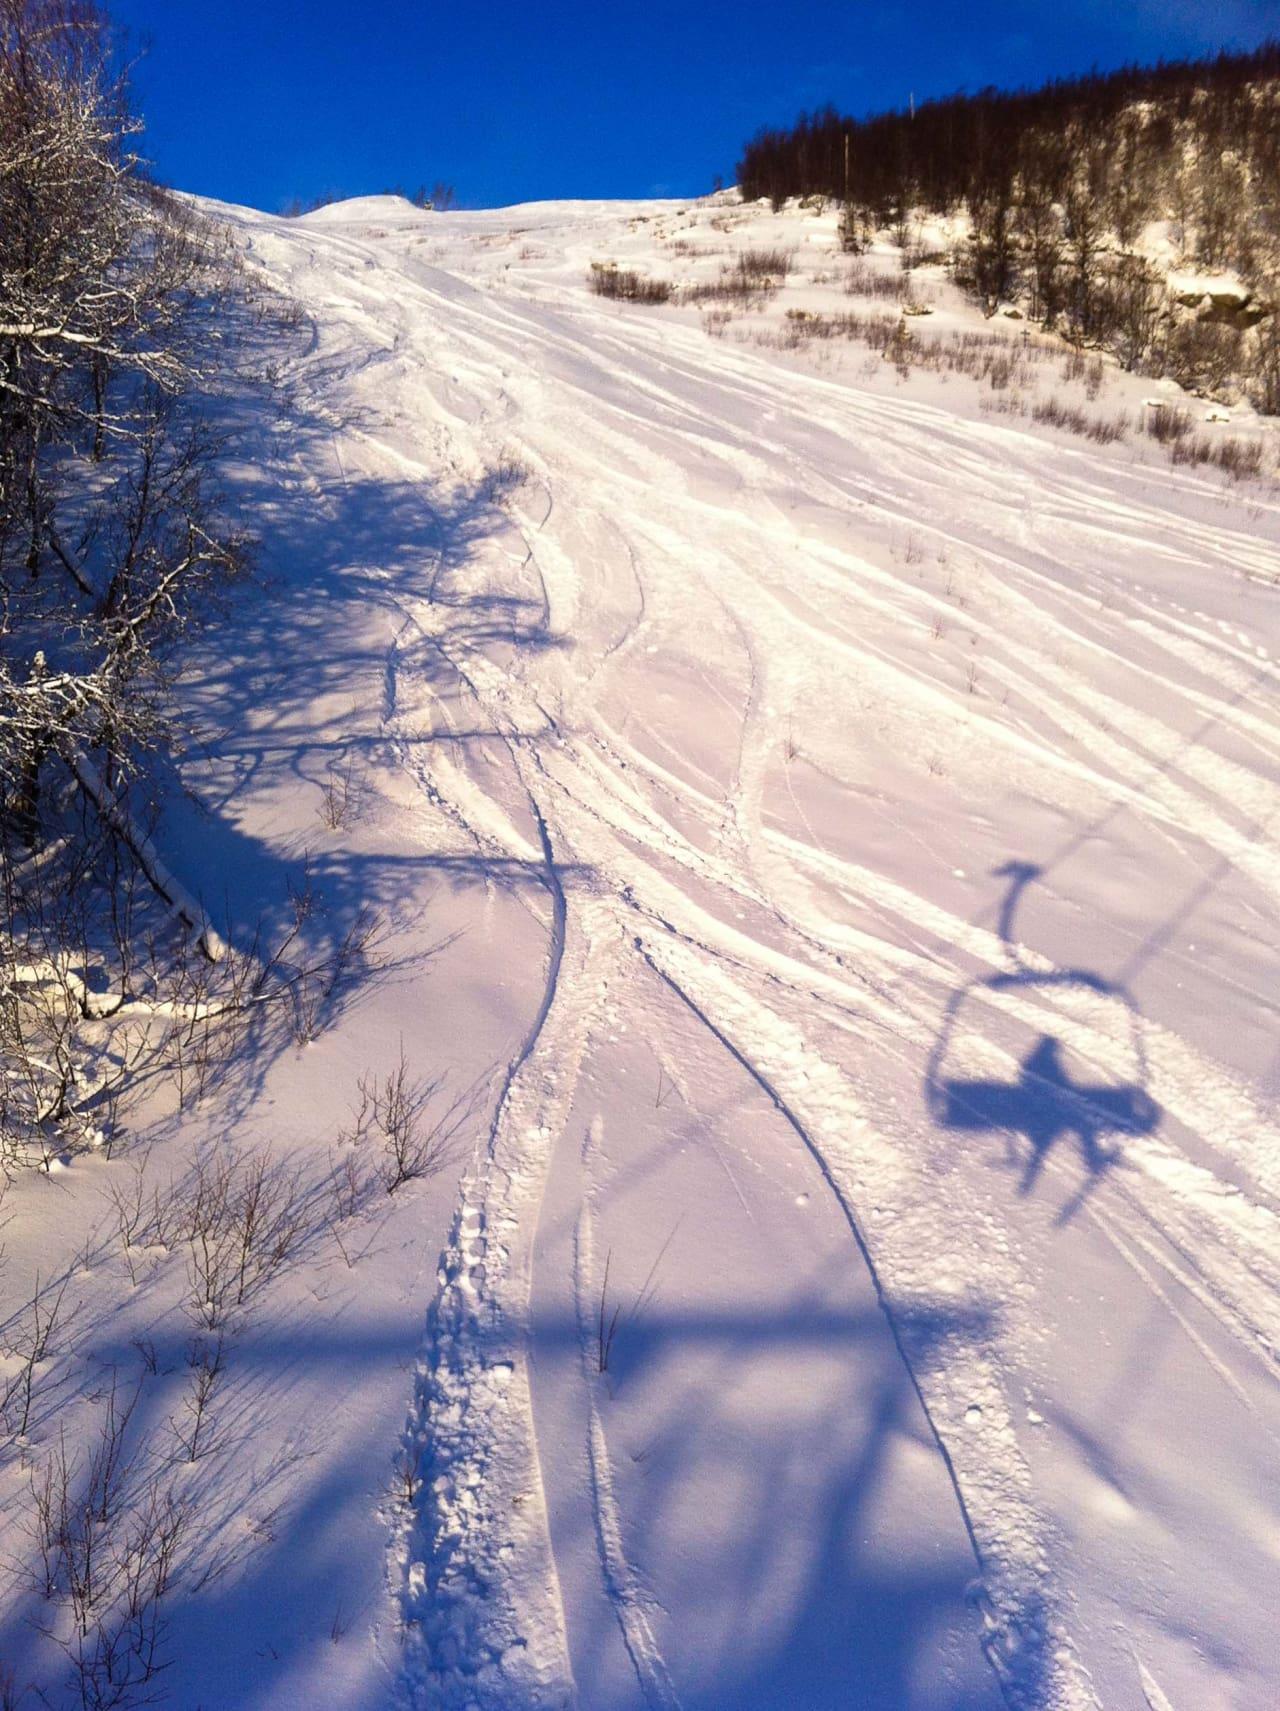 YMSE FØRE: Fra mange steder i landet meldes det om dårlig føre. Slik så det ut på Geilo rett _før_ regnet kom på julaften. Foto: Henning Reinton